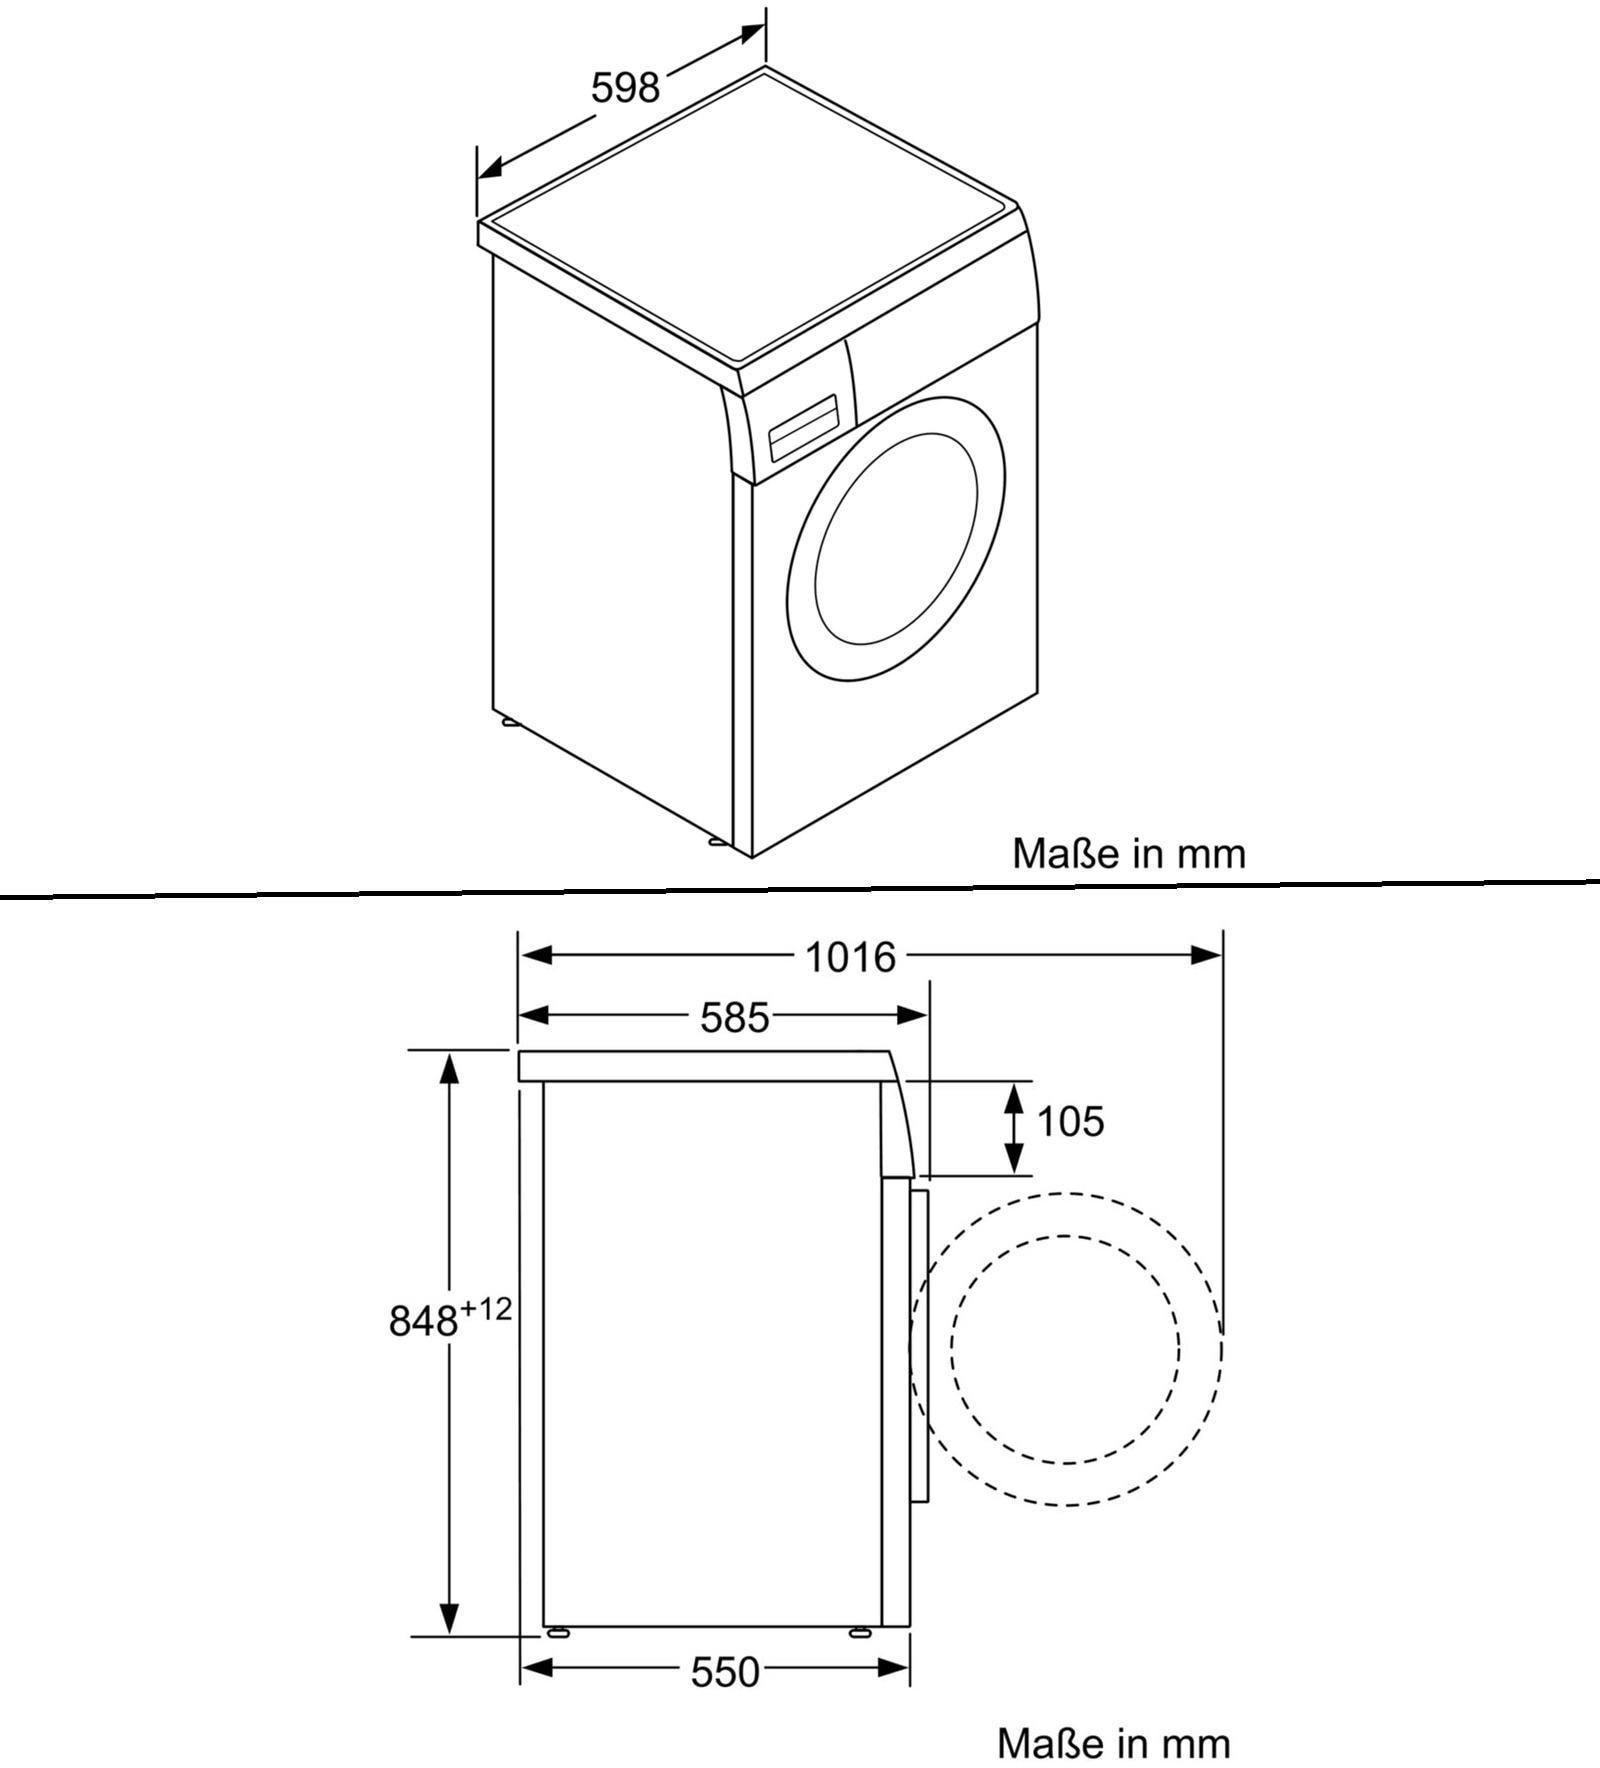 Gut bekannt Bosch WUQ284H0 8 kg A+++ Waschmaschine Frontlader, 1400 U/min EX31